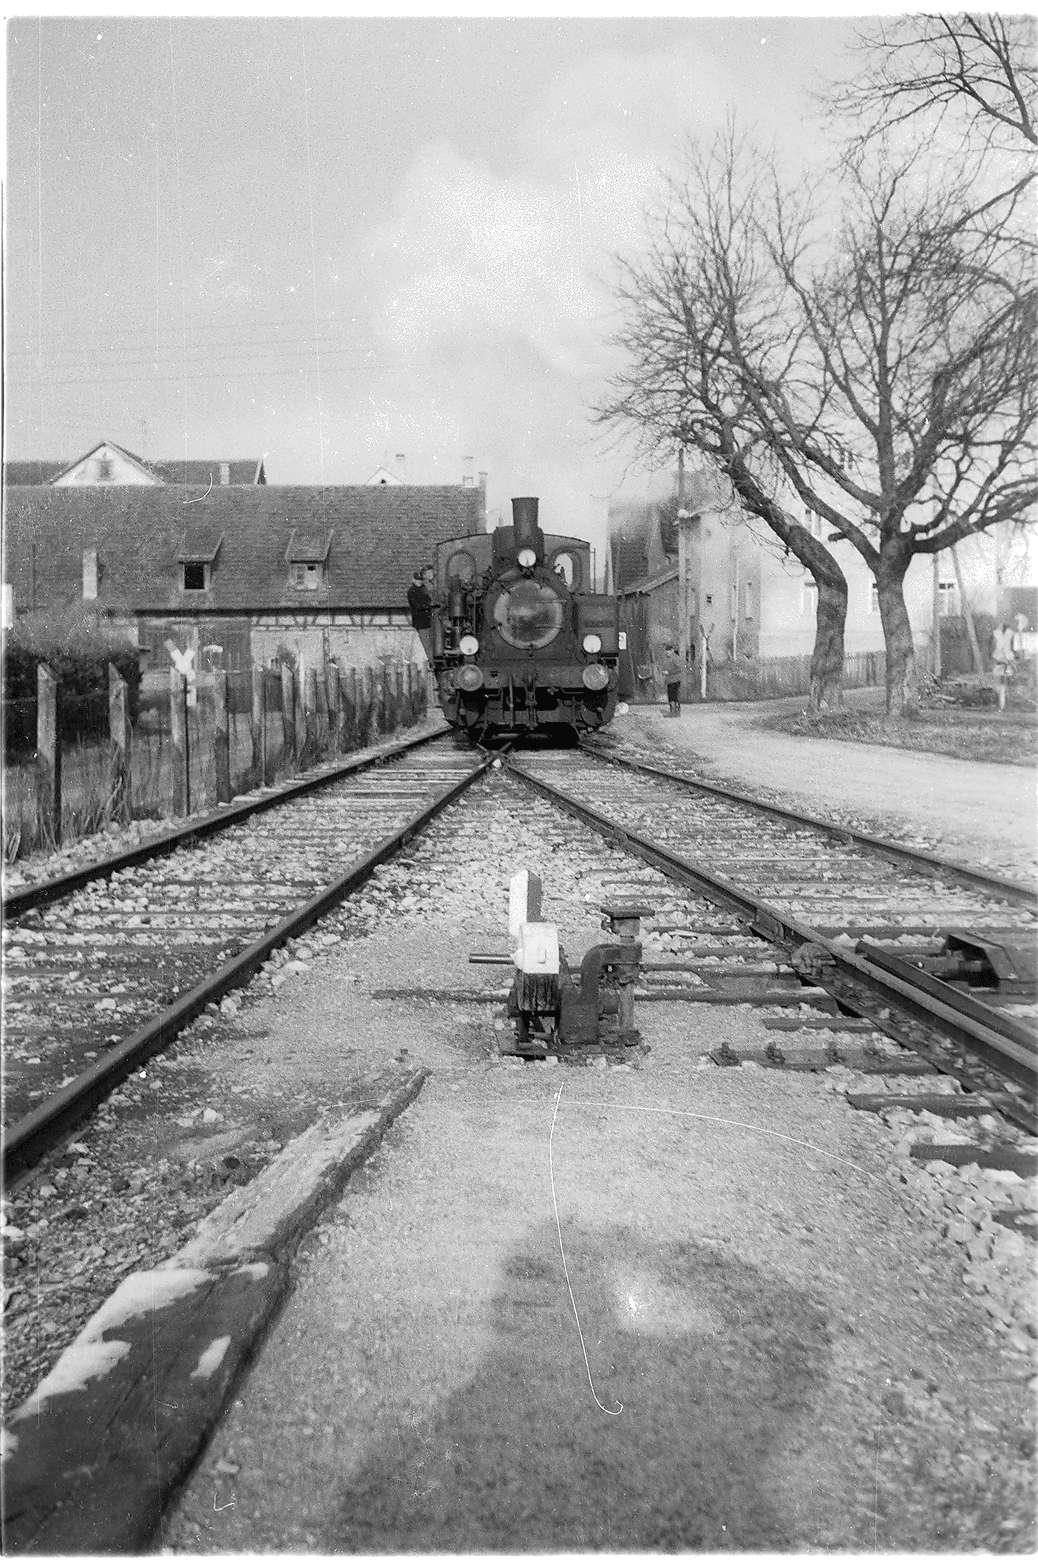 Bahnhof Trochtelfingen, Lok 12, Arbeitszug, Laden von alten Schwellen, Bild 1